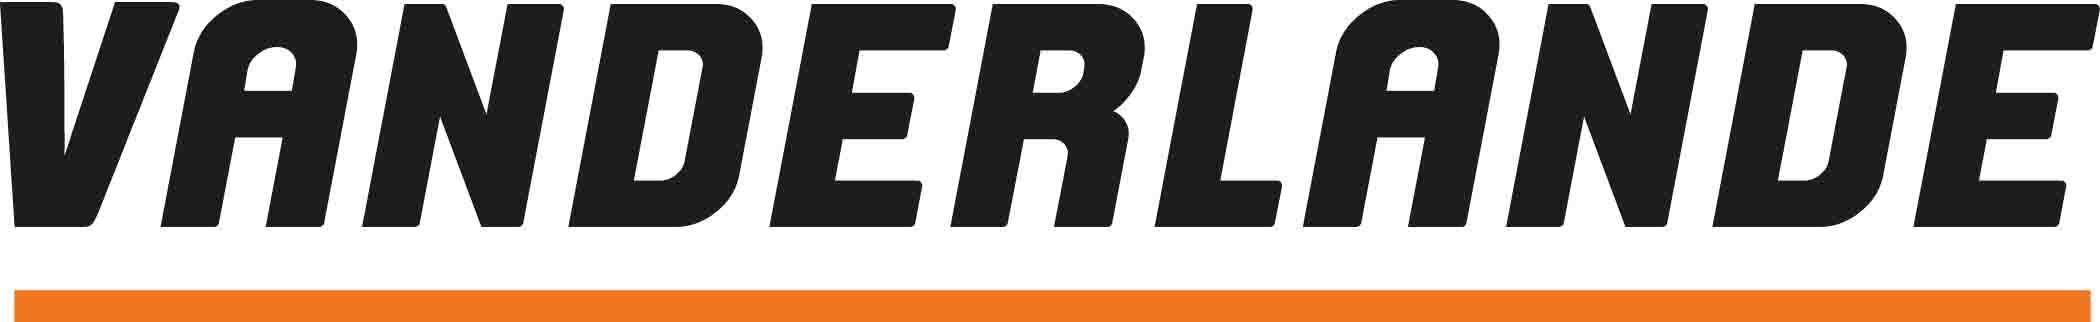 Vanderlande Beewen GmbH & Co. KG